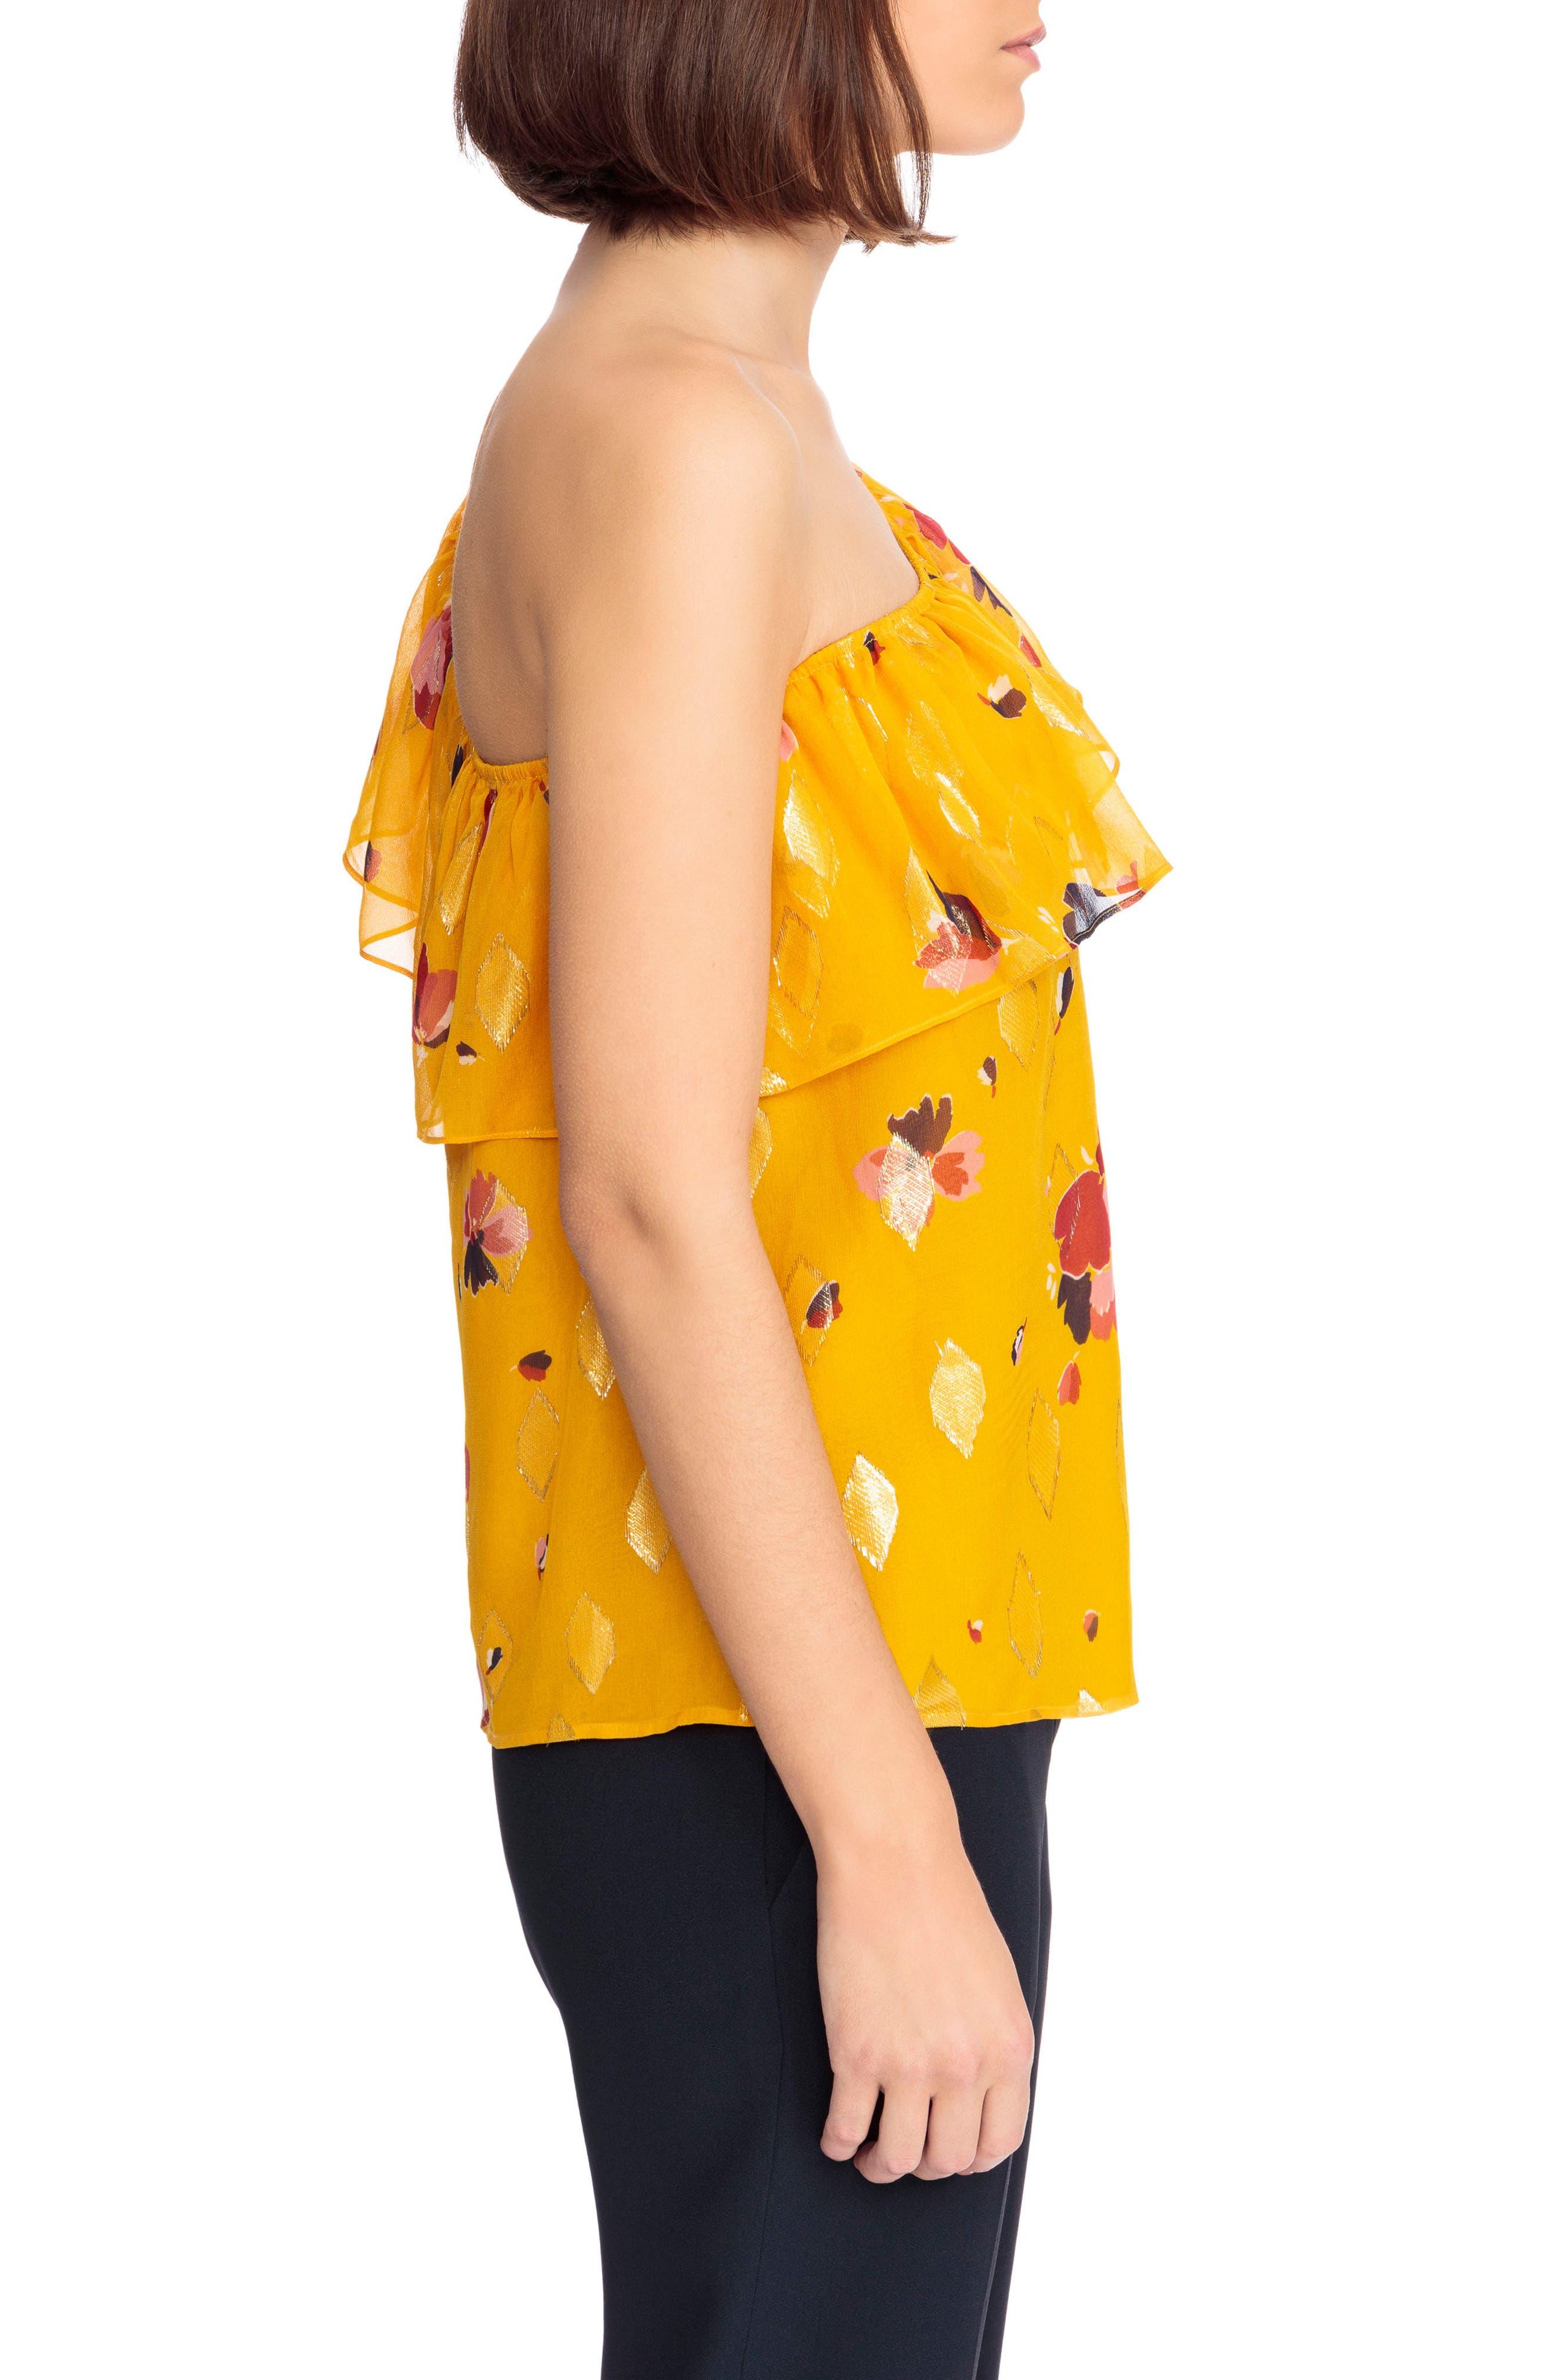 Adelie Ruffle One-Shoulder Metallic Silk Blouse,                             Alternate thumbnail 3, color,                             Big Flowers 60S On Saffron